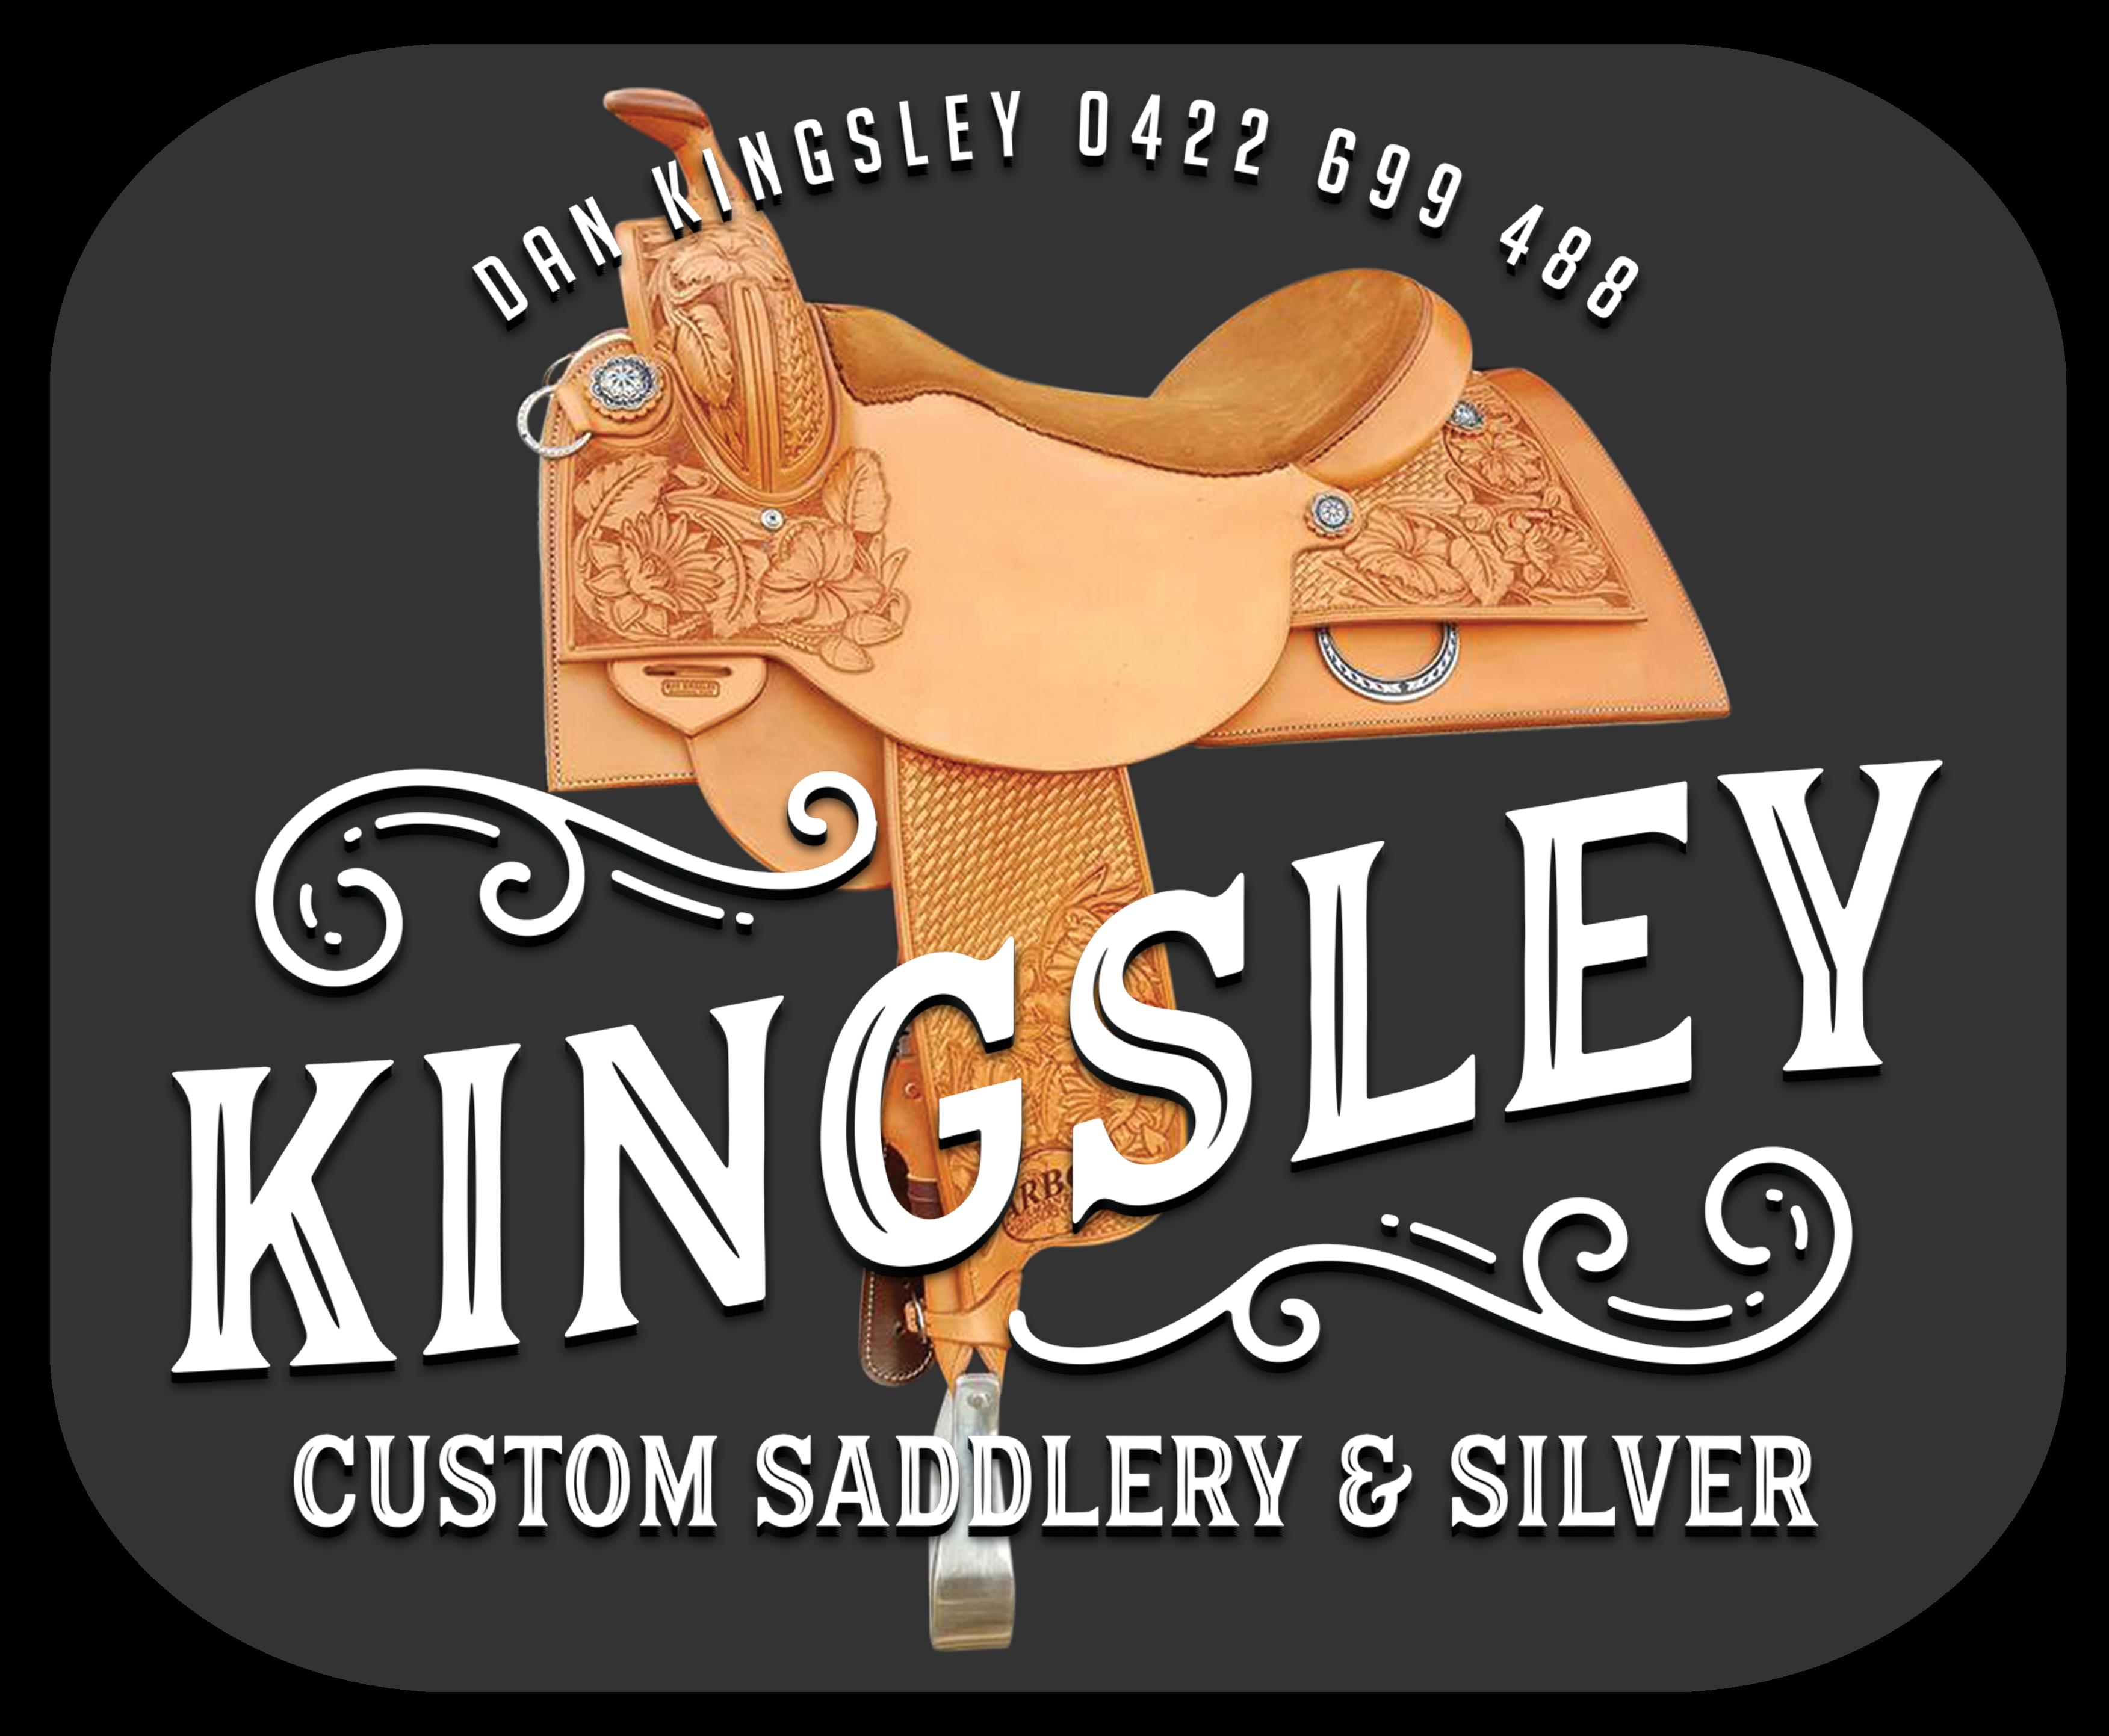 Kingsley Custom Saddlery